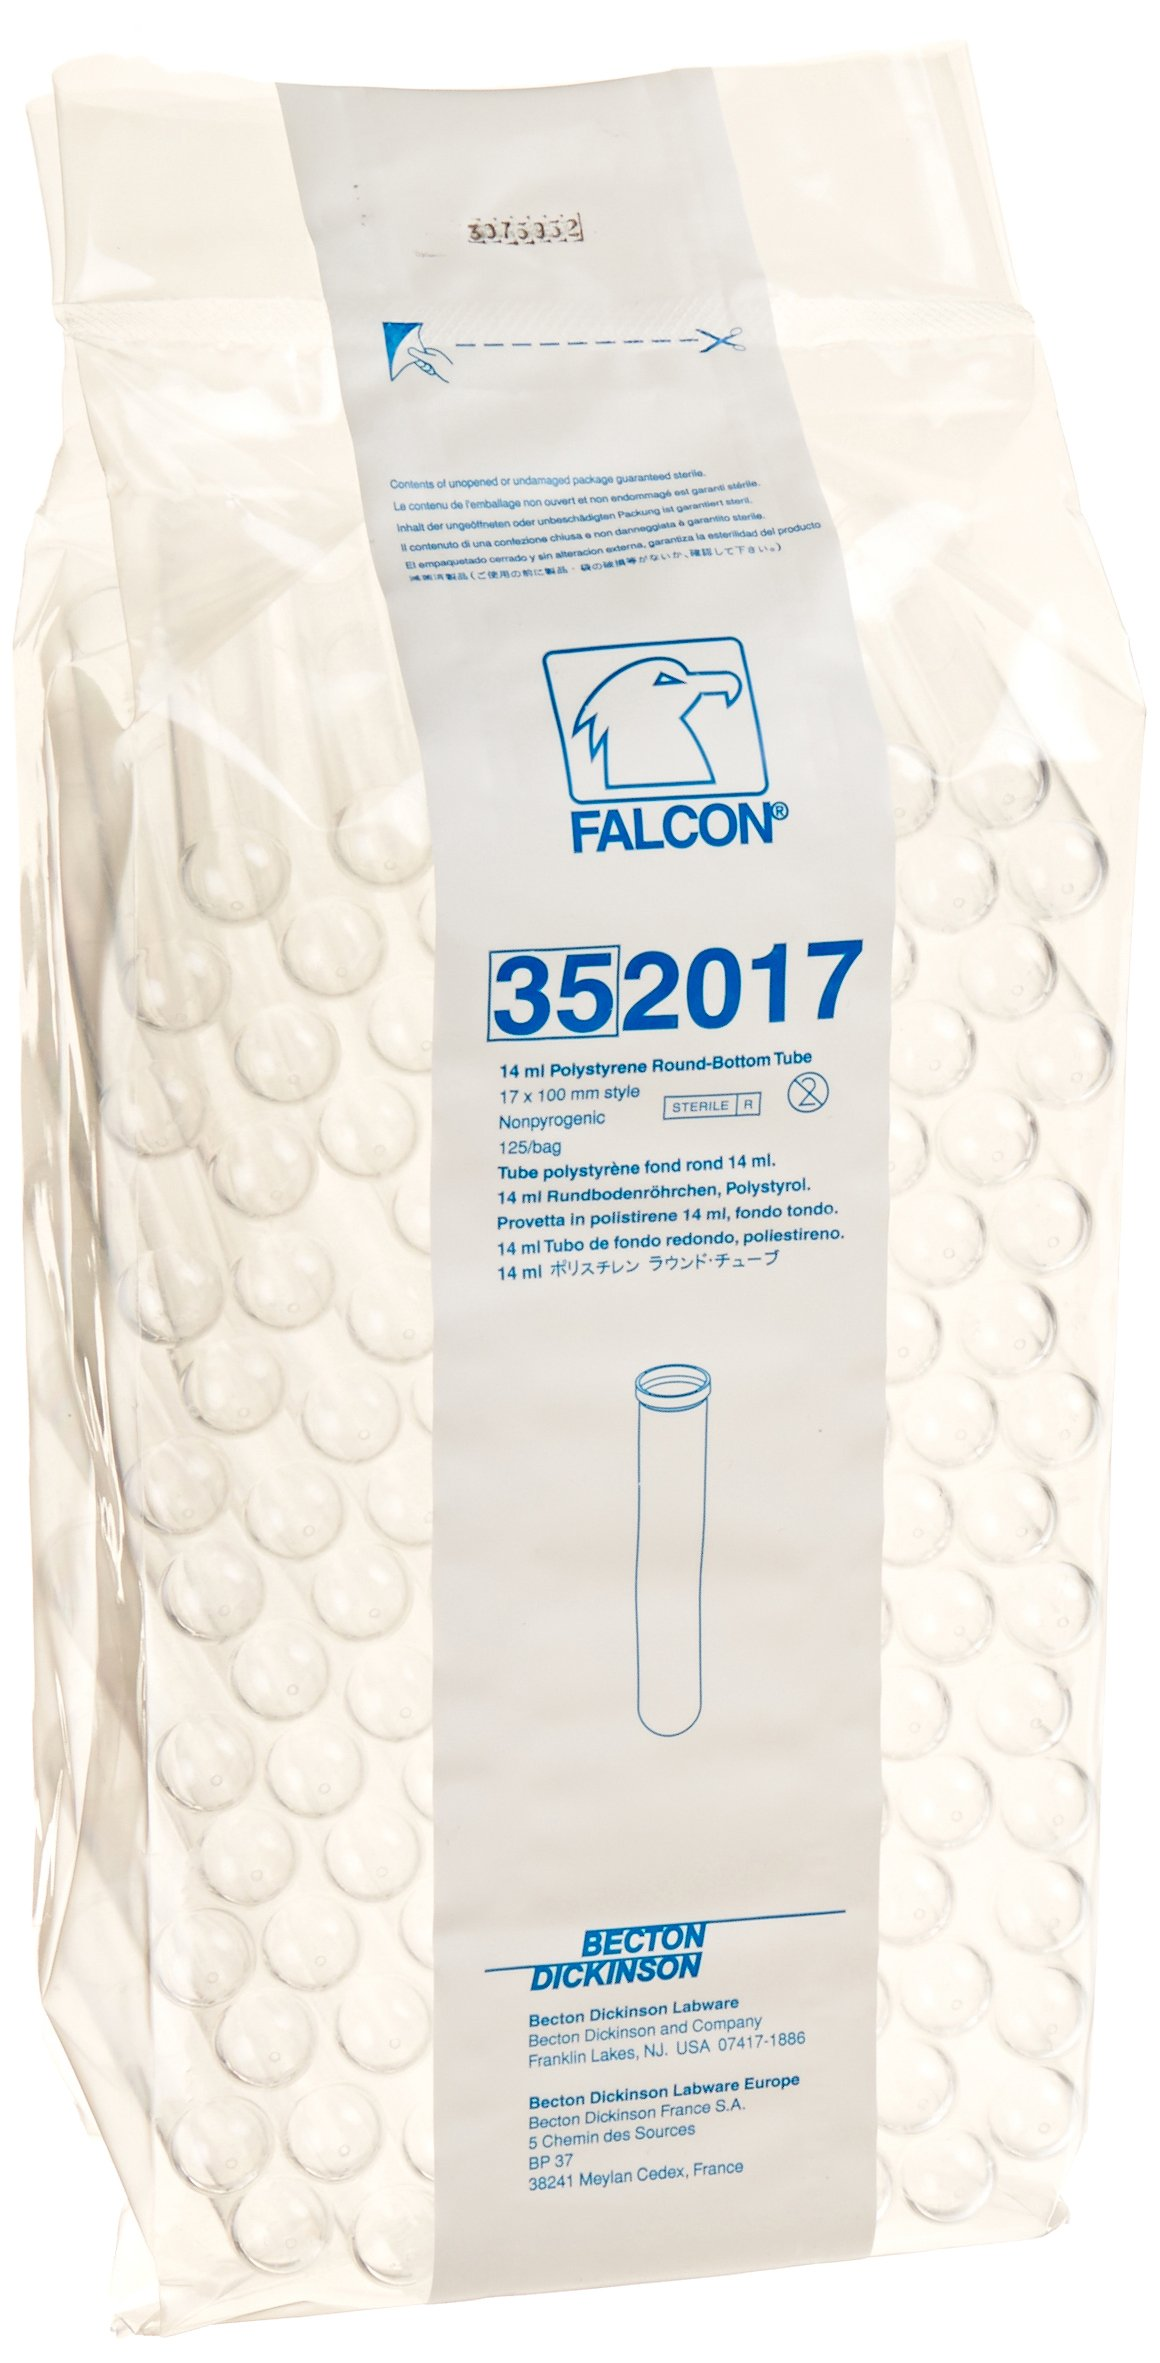 BD 352017 Falcon Polystyrene Round Bottom Centrifuge Test Tube, 17mm Diameter x 100mm Length, 14mL Capacity, 1400 RCF (Case of 1000)